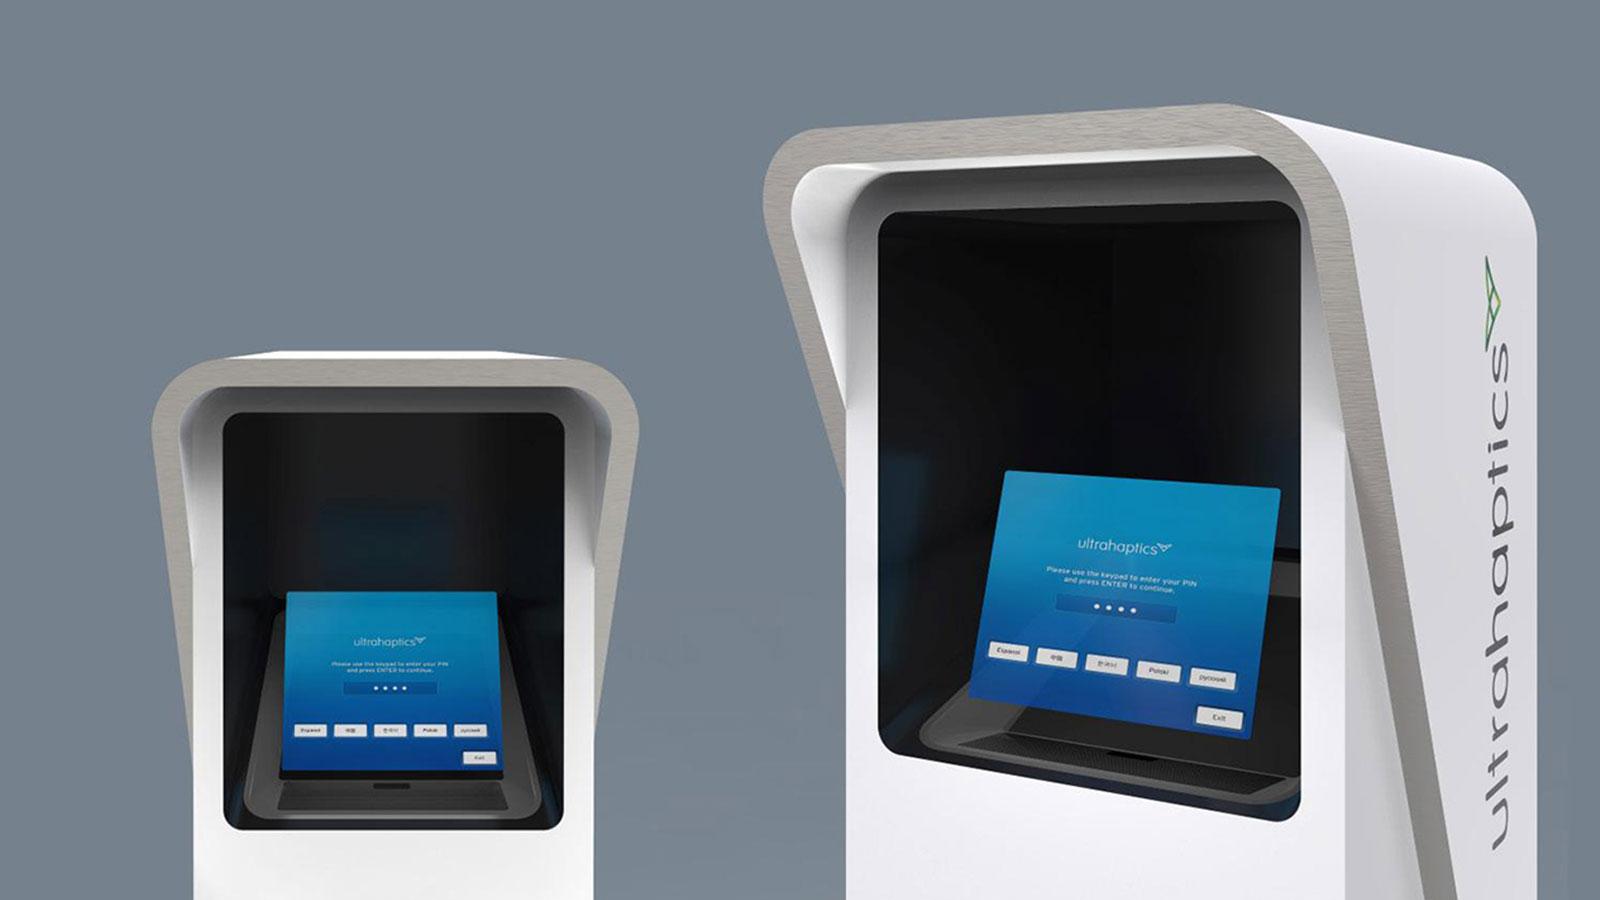 Asukanet and Ultrahaptics haptic hologram ATM